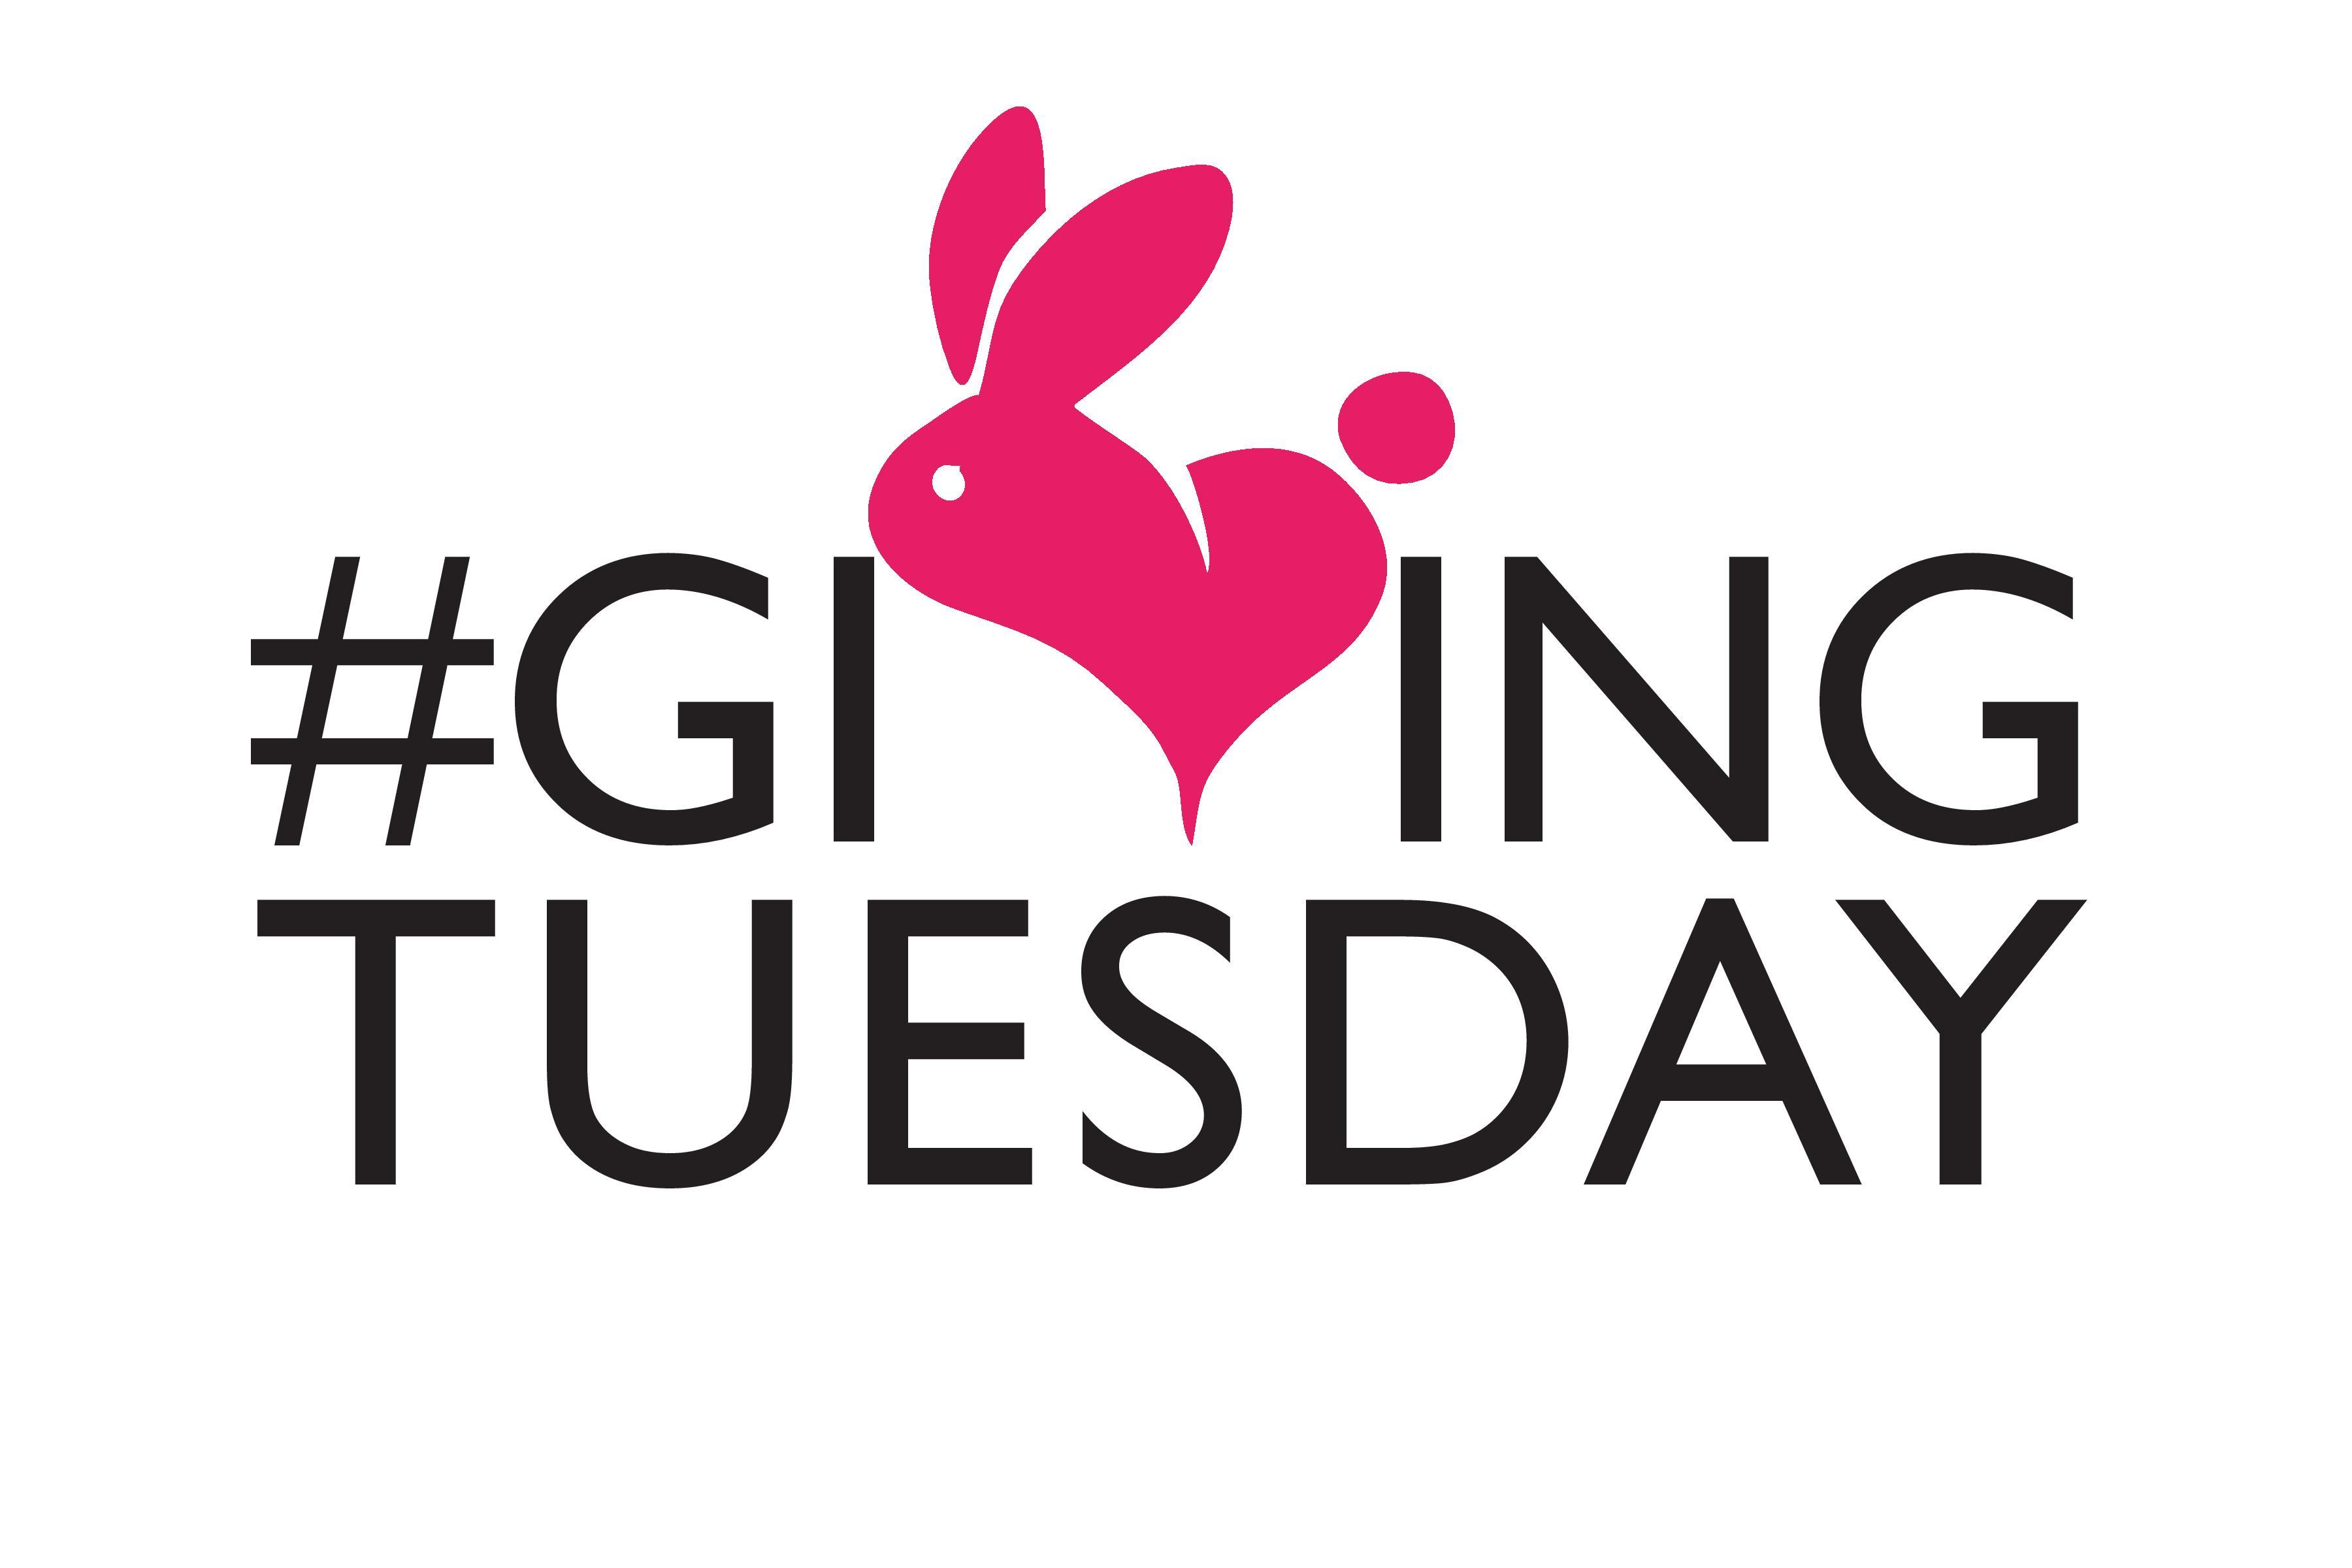 Giving Back on #GivingTuesday – November 28, 2017